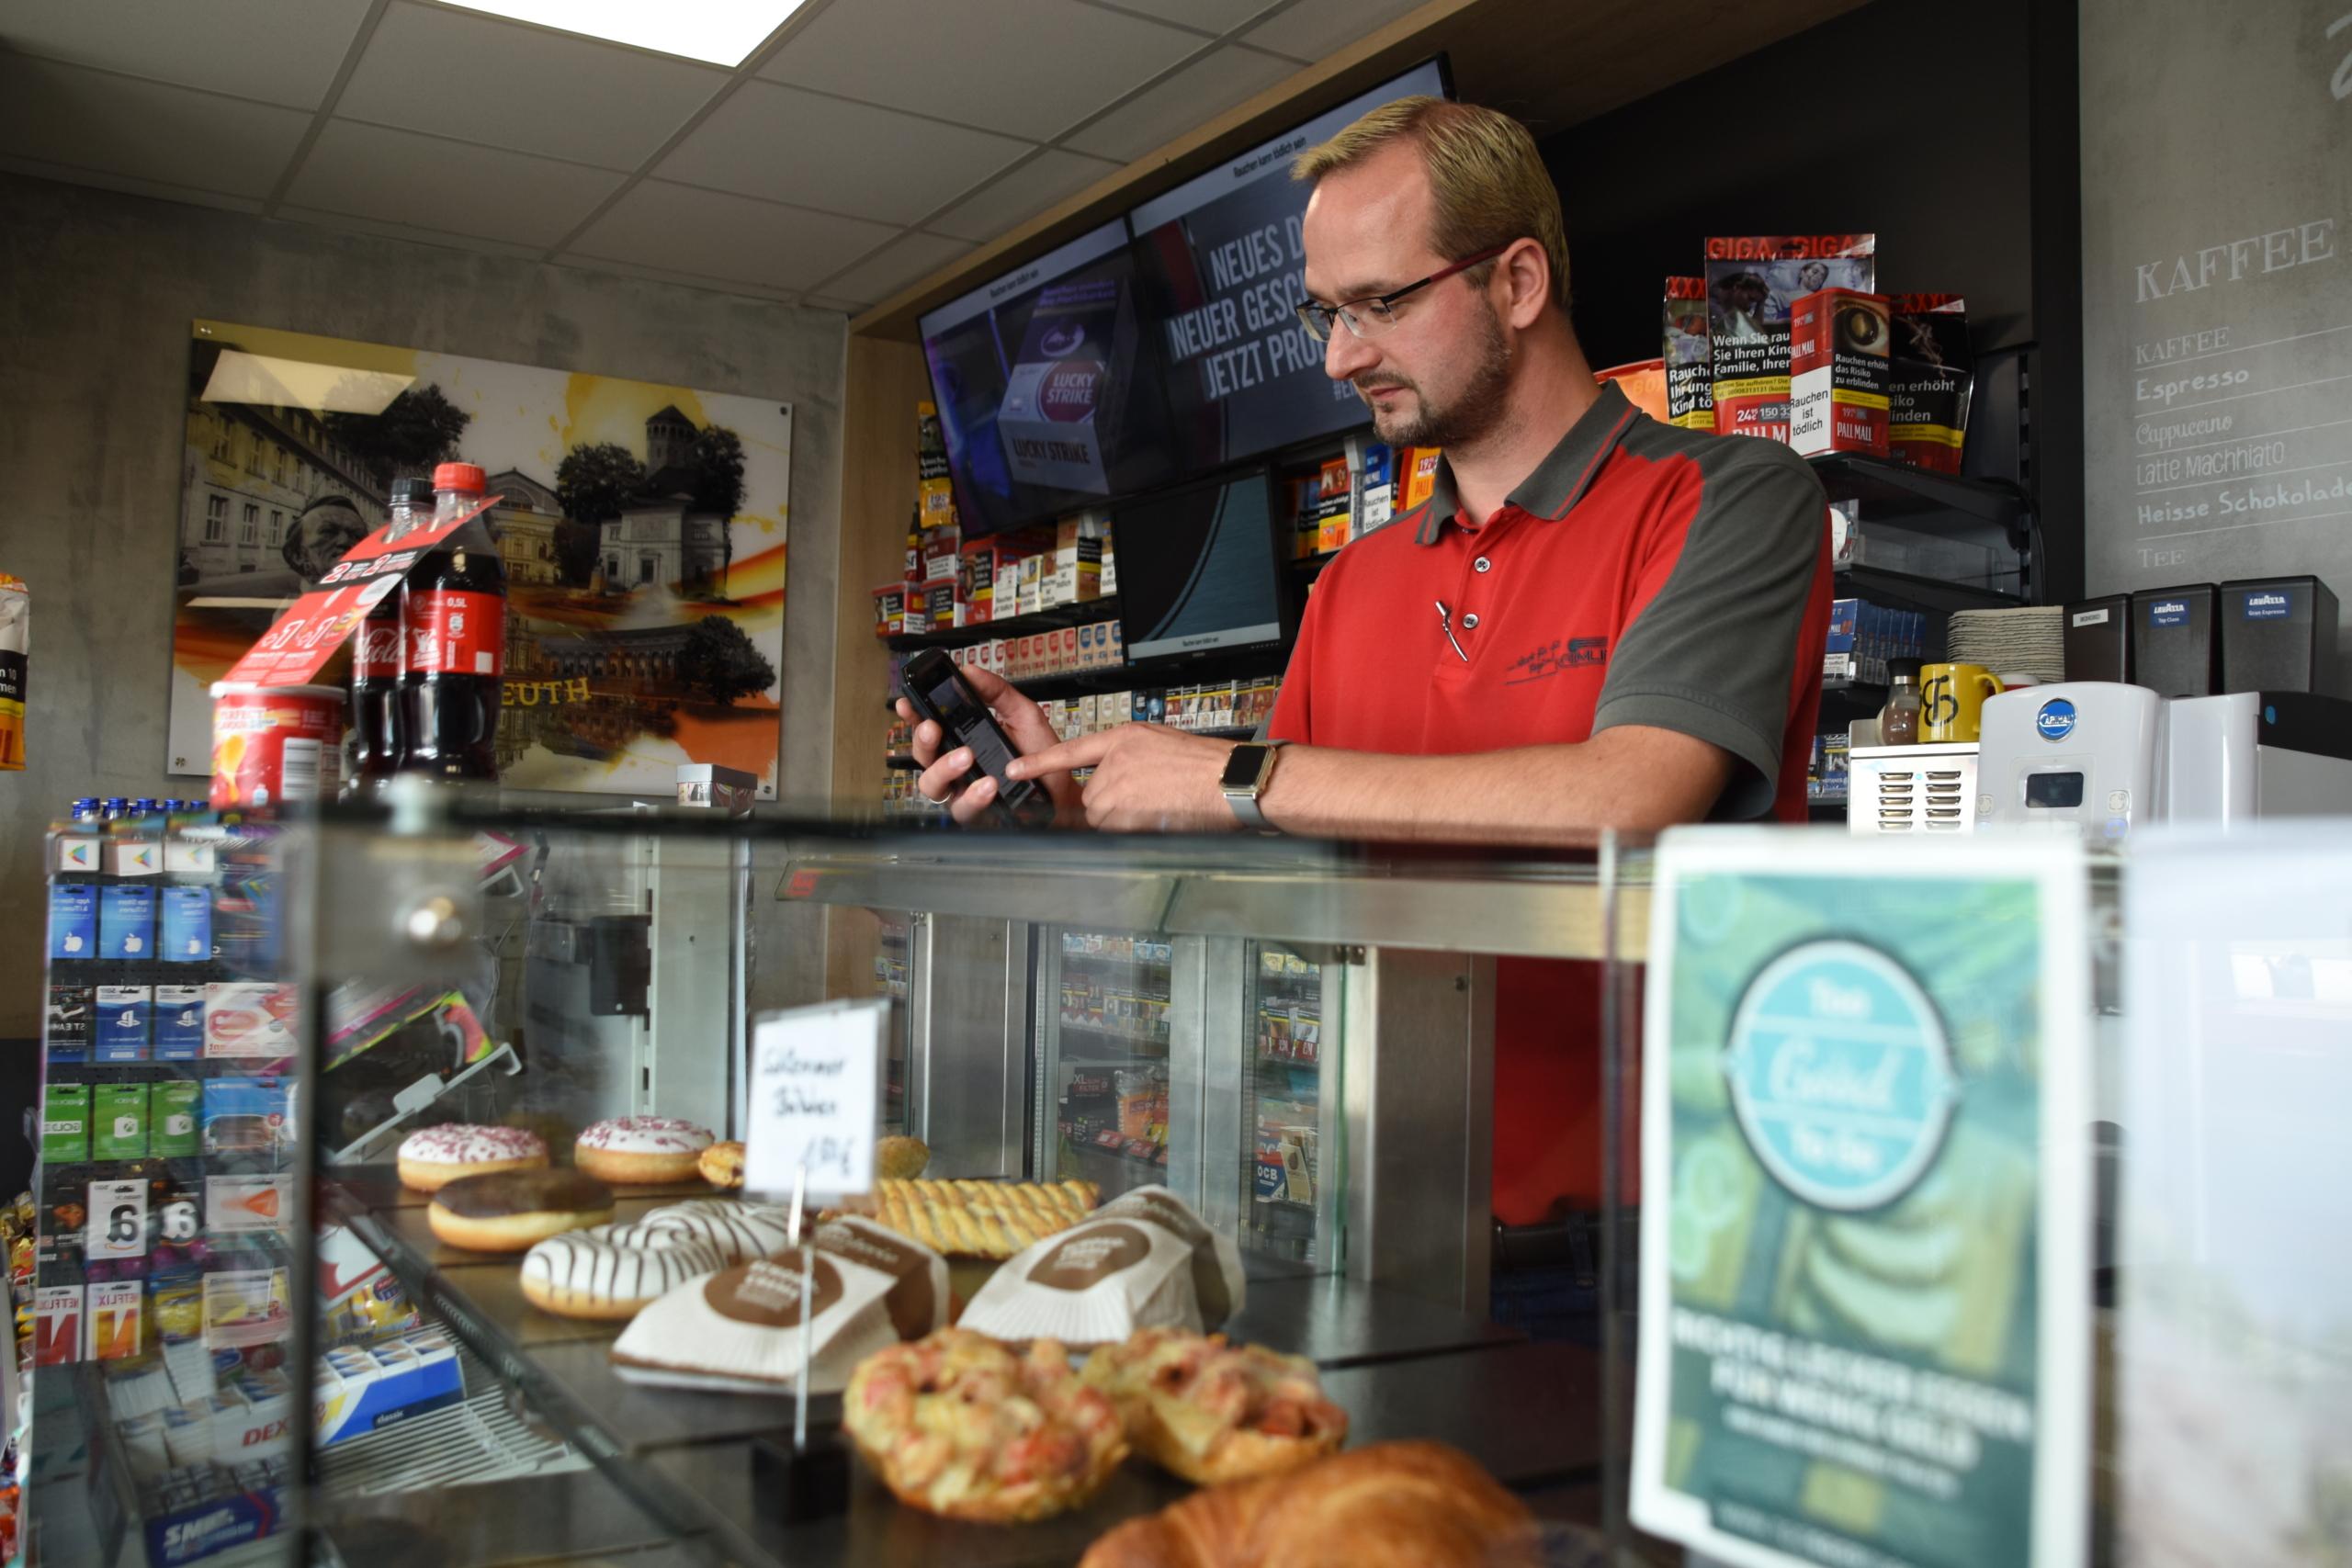 Die App Too Good To Go gegen Lebensmittelverschwendung in Bayreuth